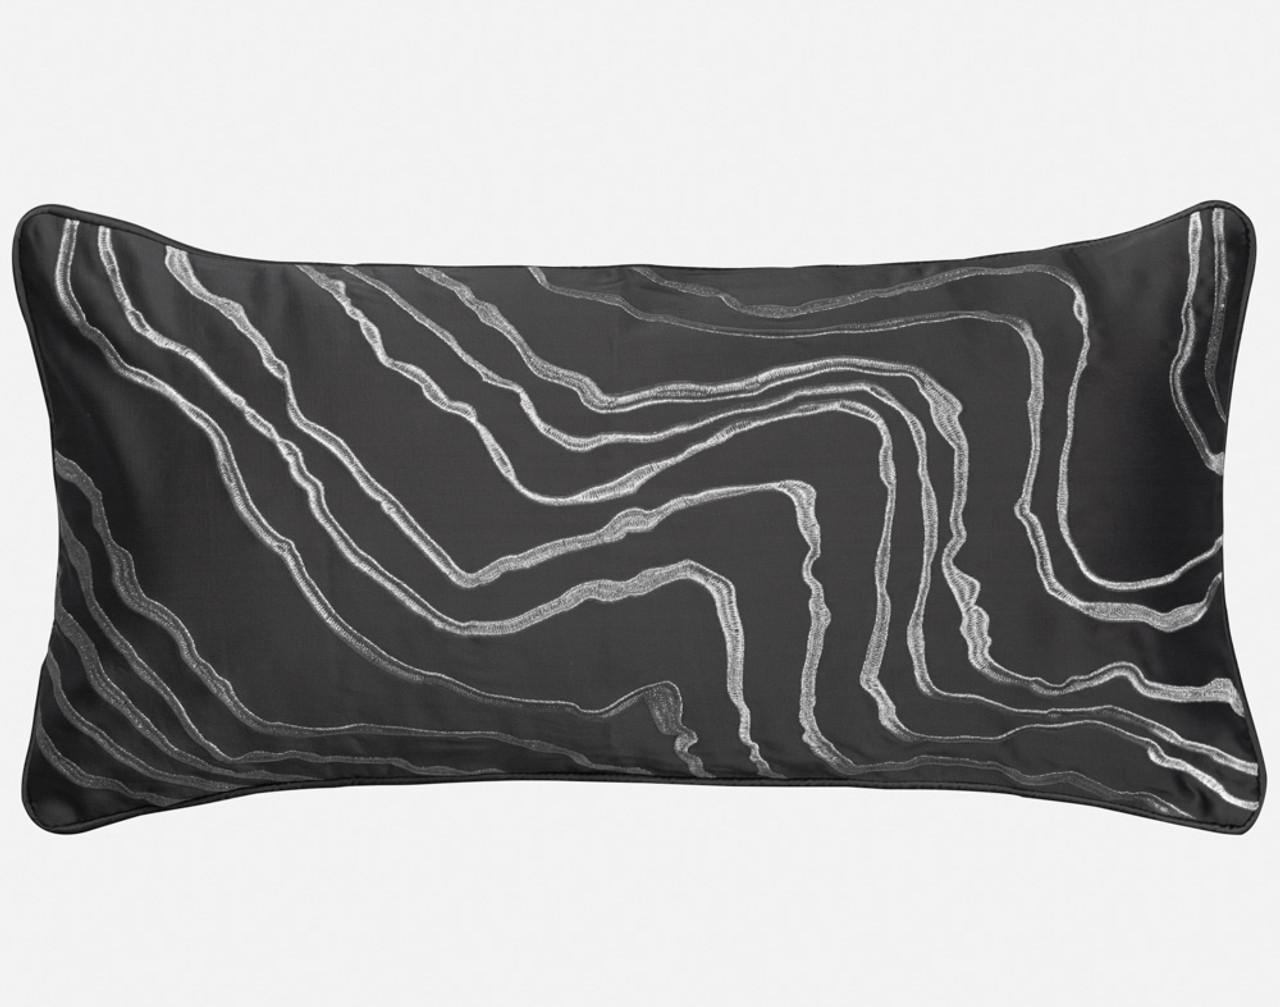 Close-up of Palisade Black Boudoir Pillow Cover.